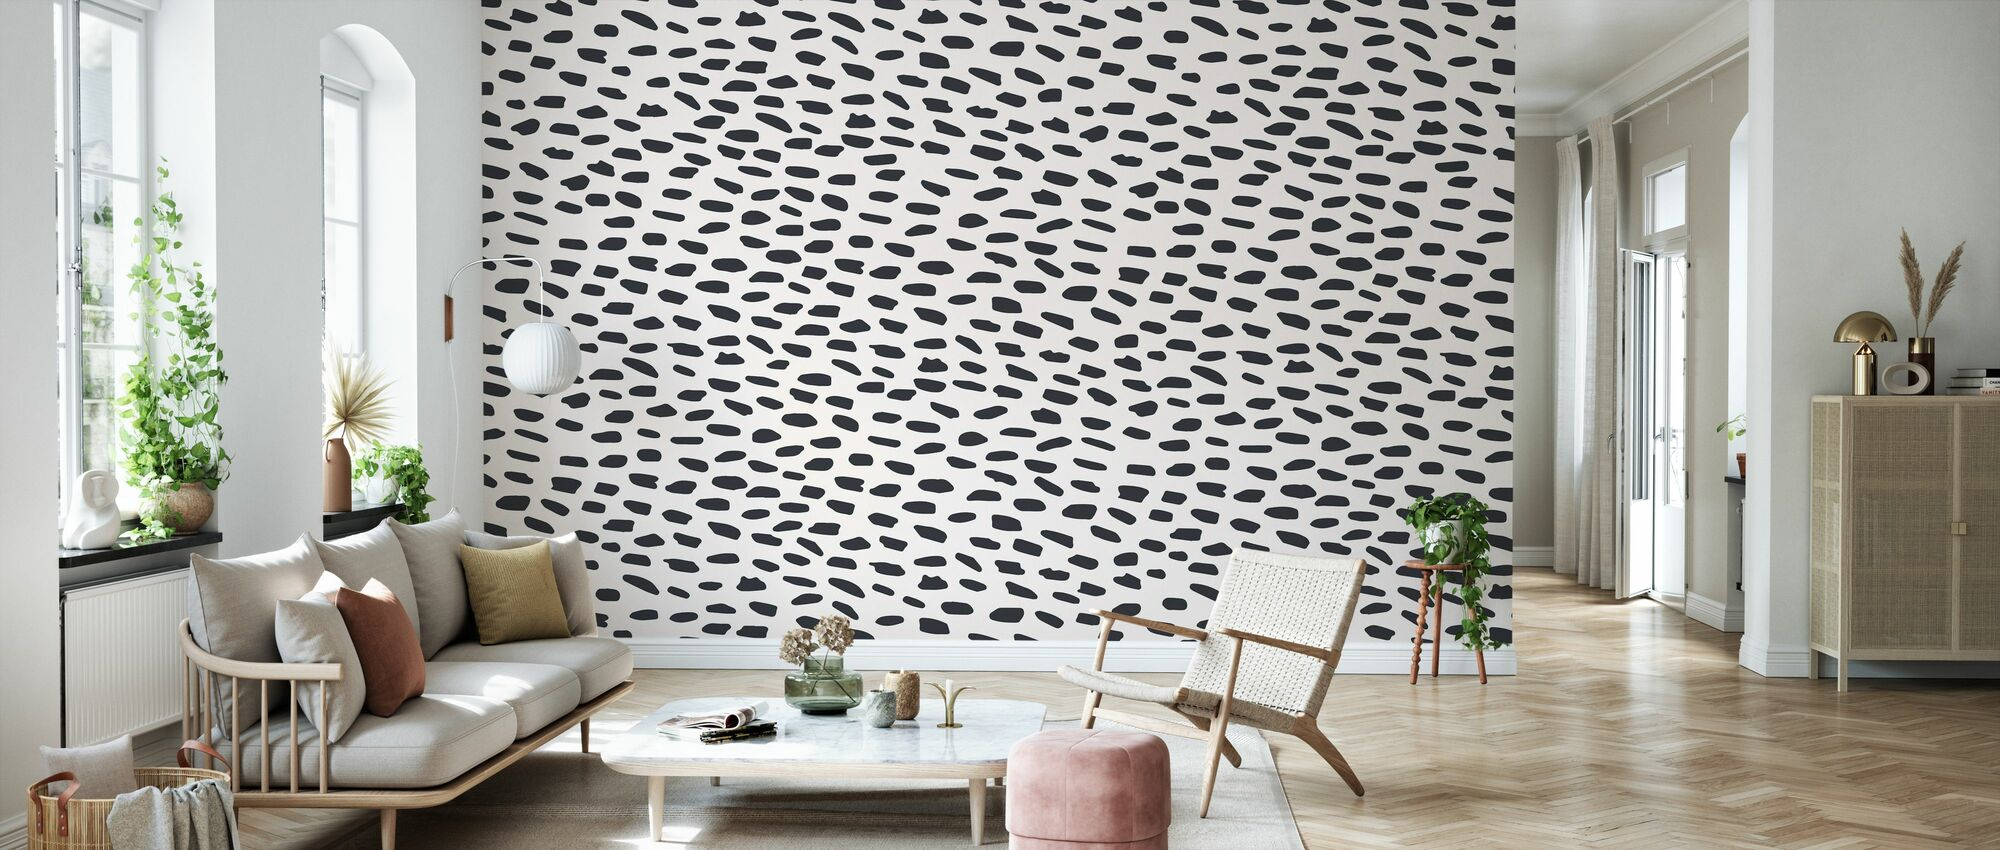 Salty Leopard - Wallpaper - Living Room